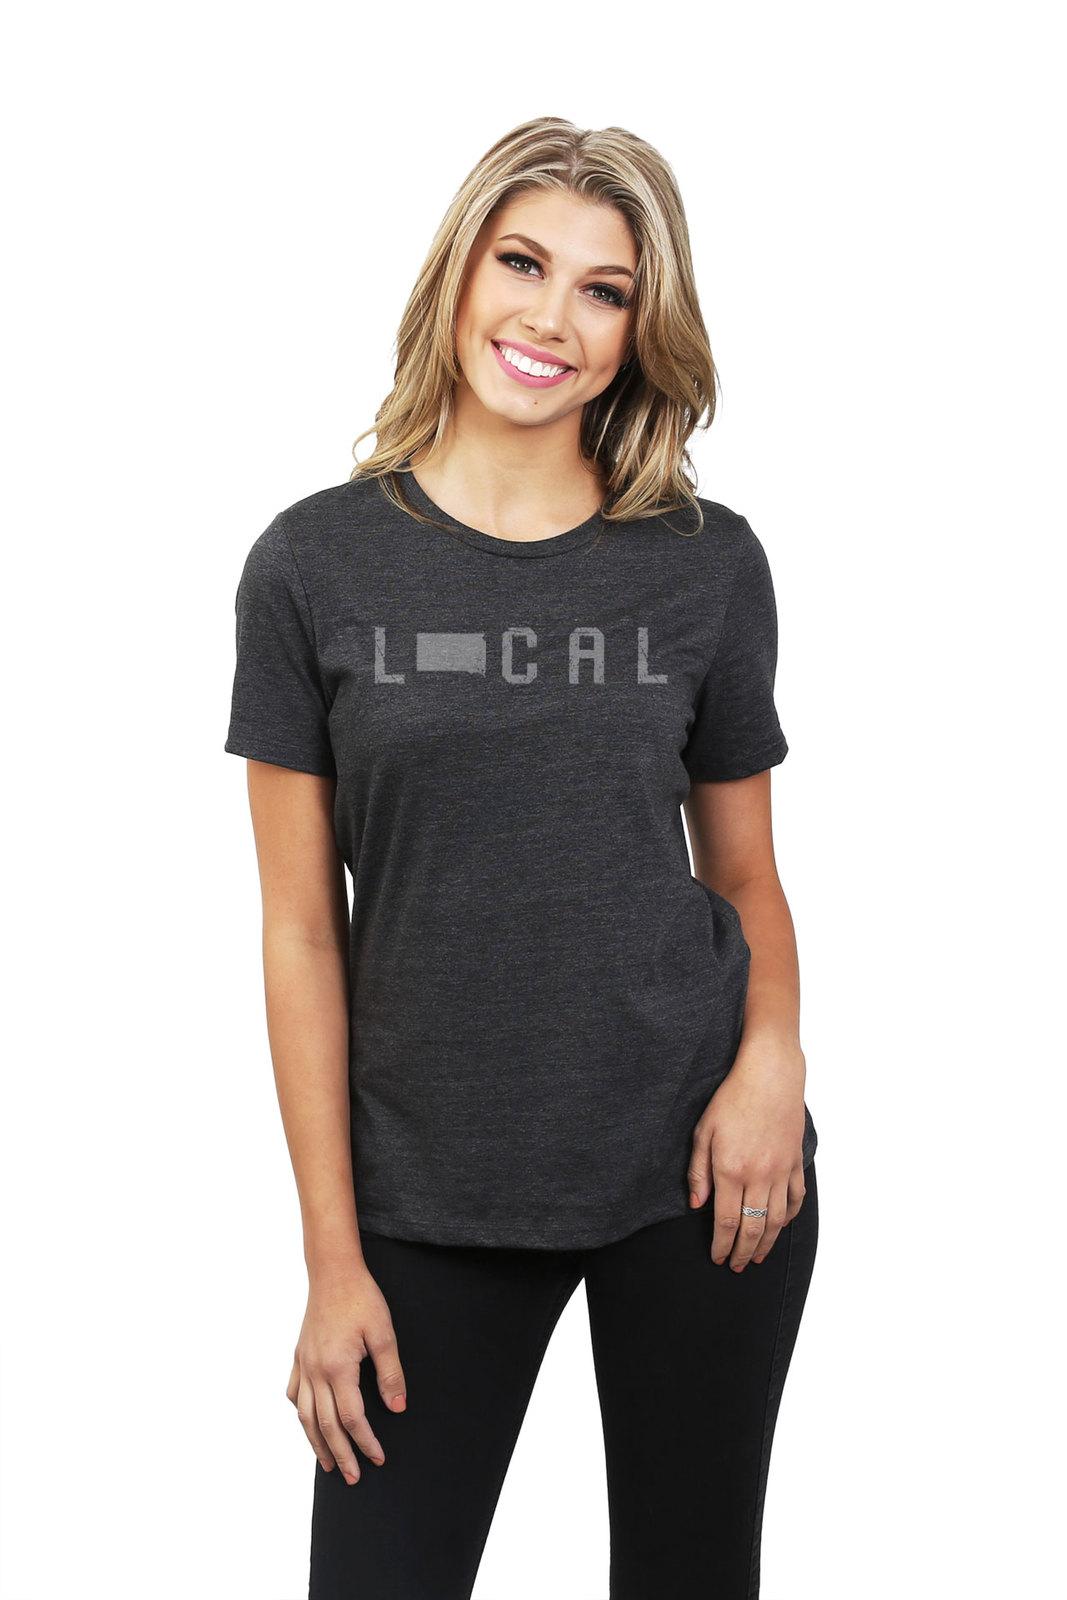 Thread Tank Local South Dakota State Women's Relaxed T-Shirt Tee Charcoal Grey